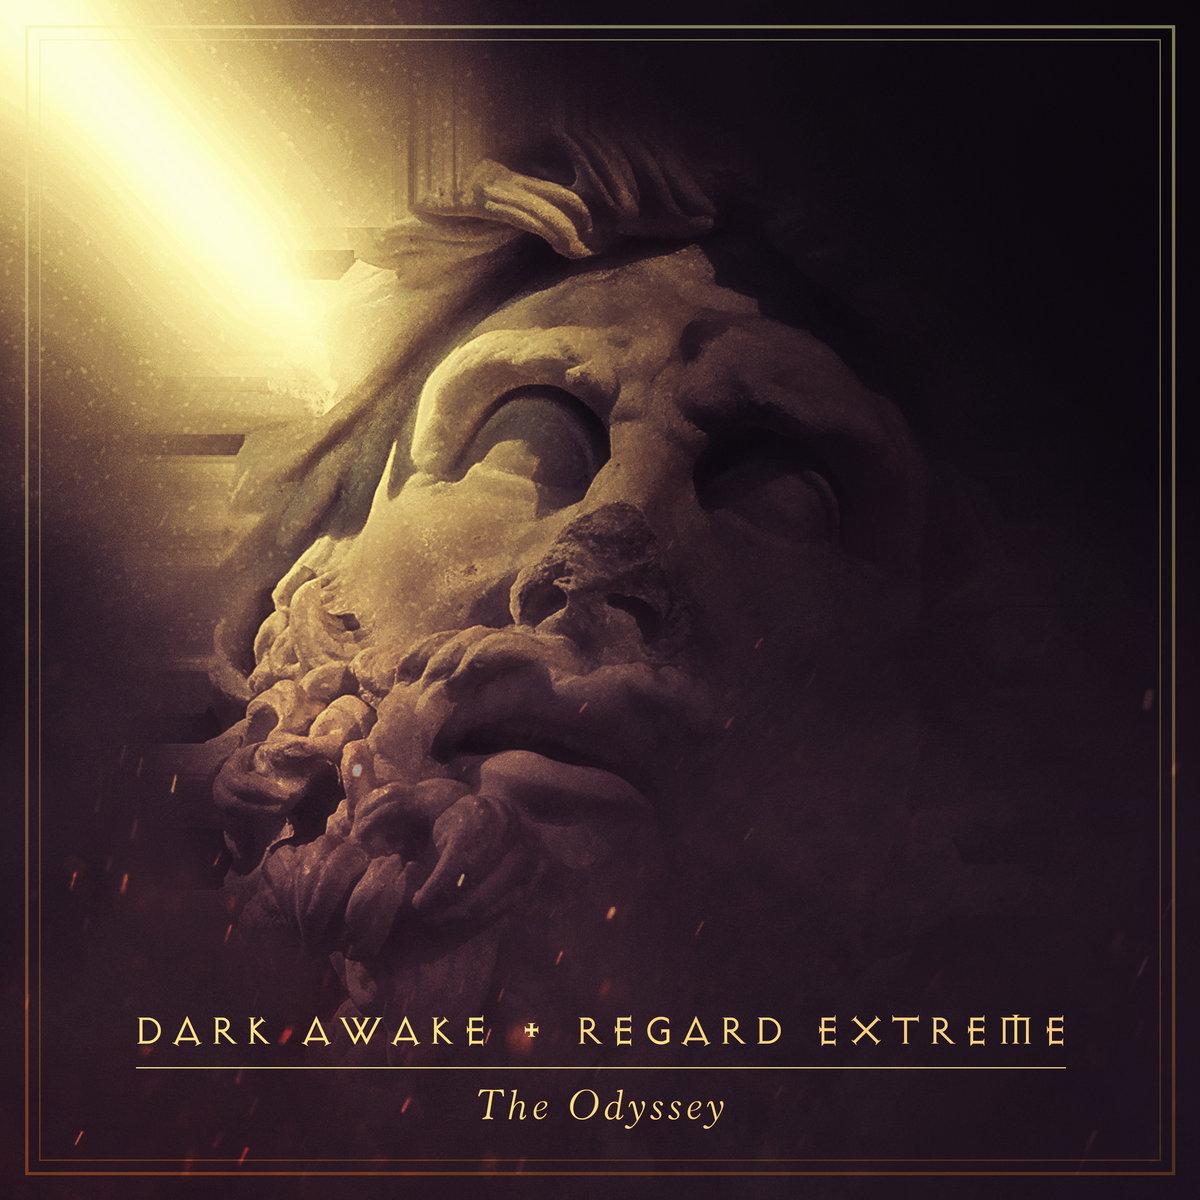 From The Odyssey By Dark Awake Regard Extreme